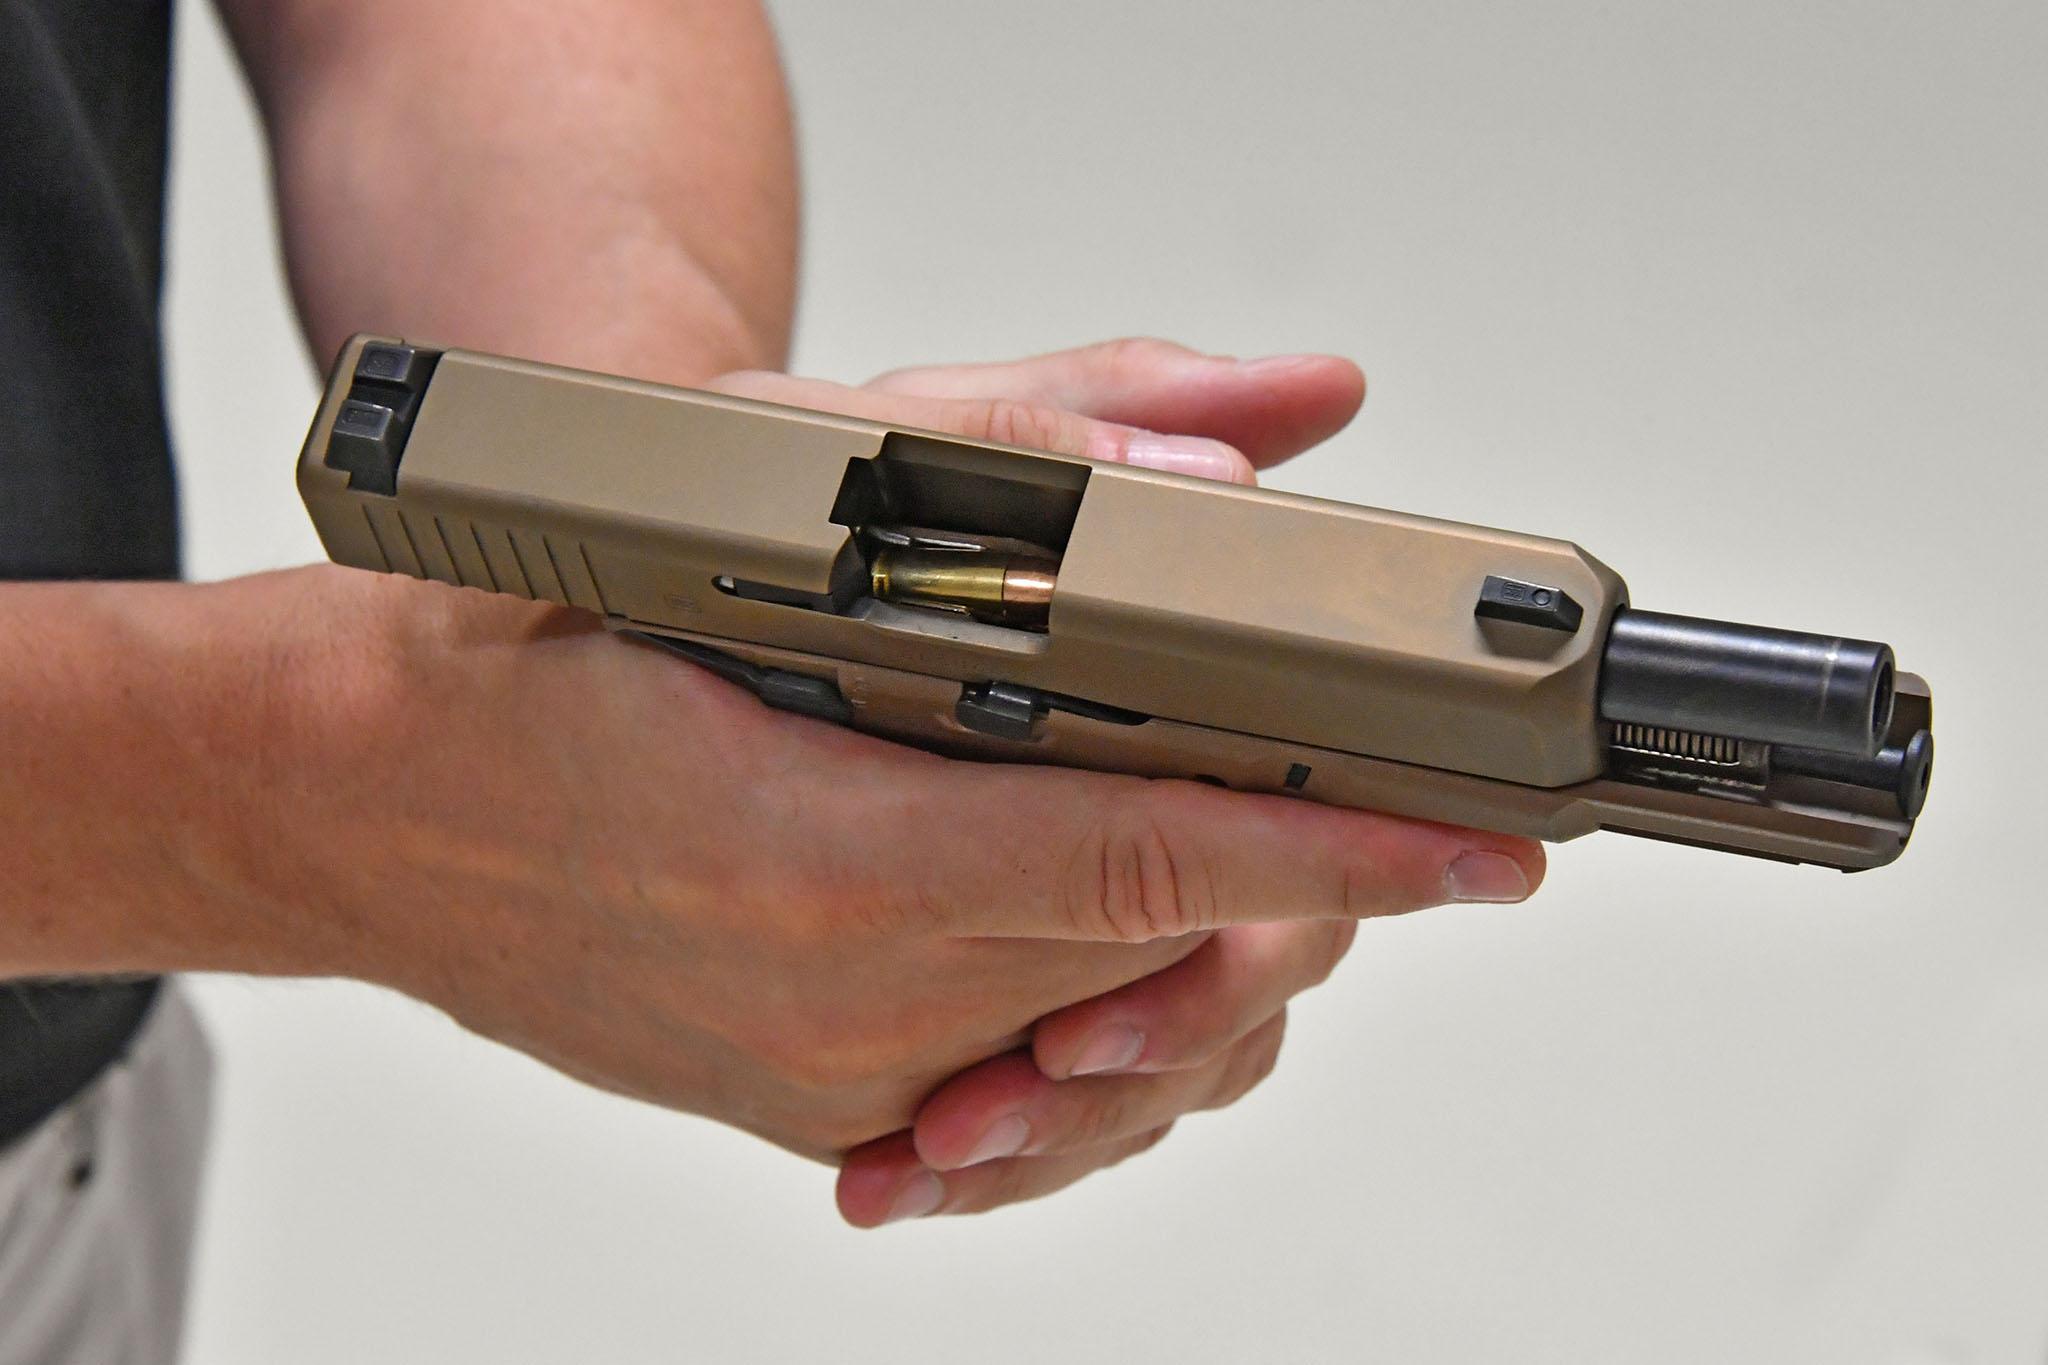 glock 19 mhs modular handgun system all4shooters com rh all4shooters com glock 19 manual safety glock 19 user manual